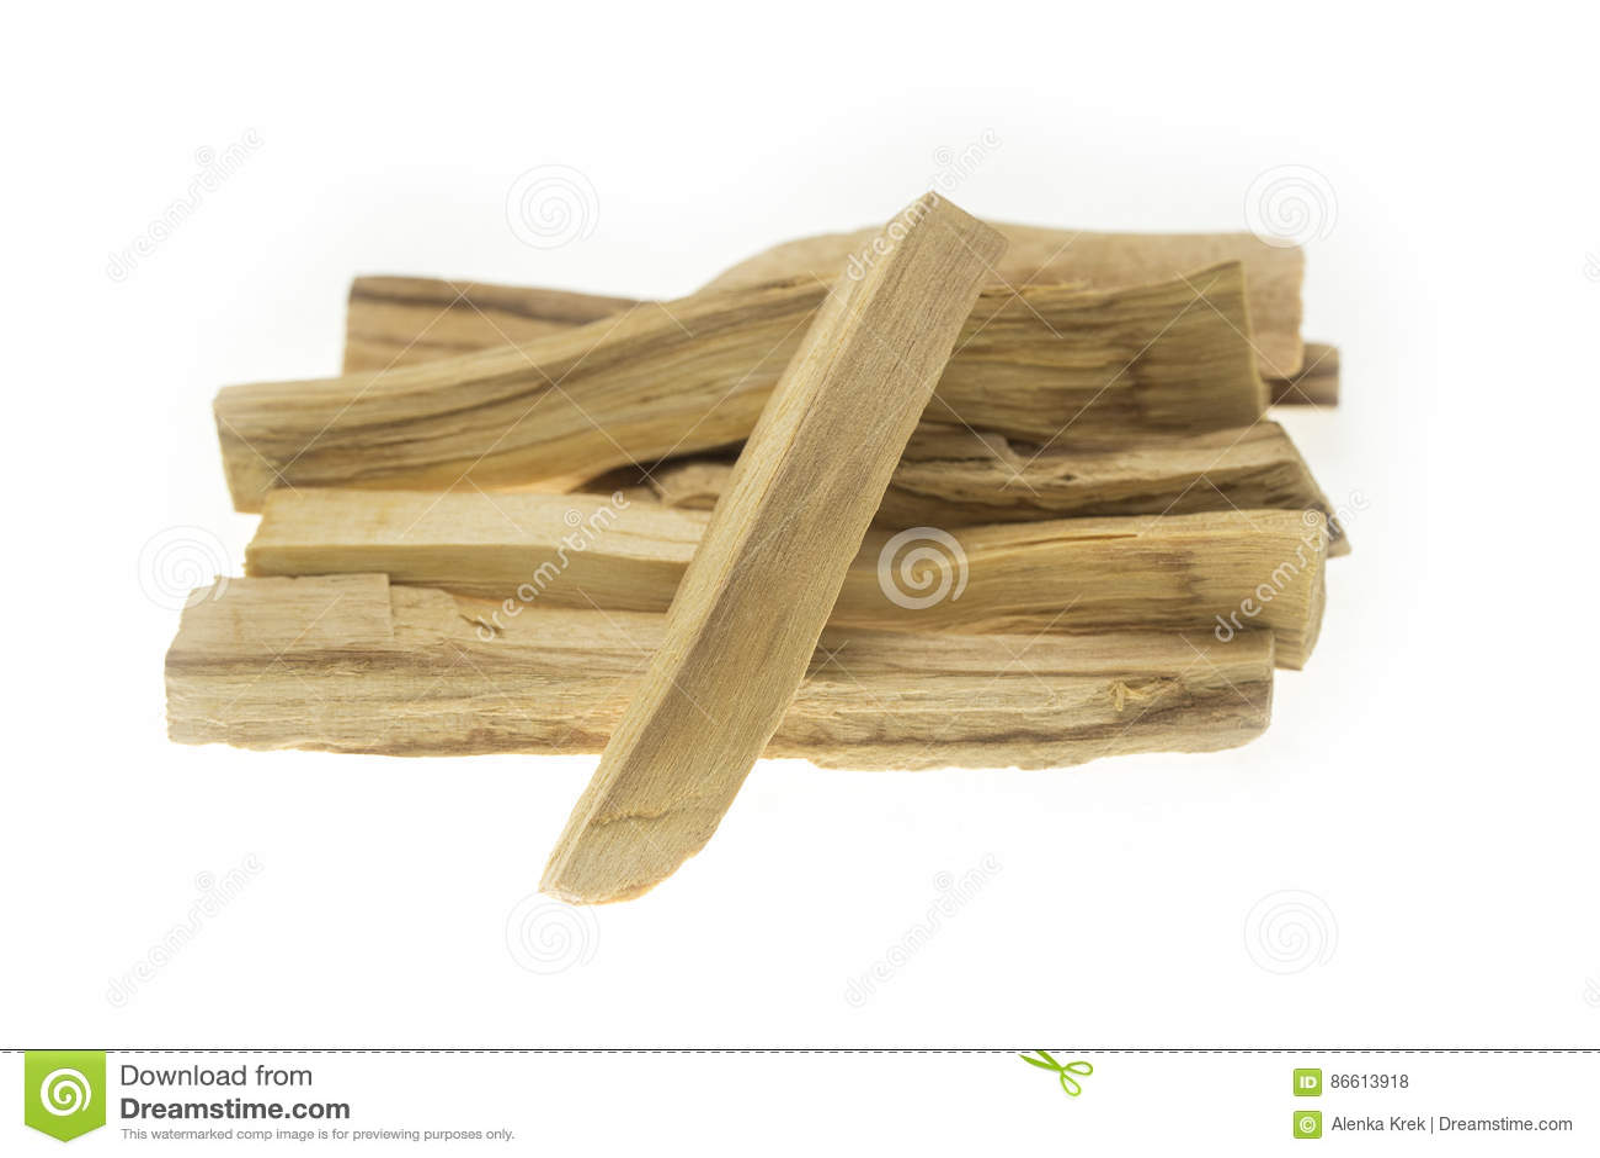 Pile of palo santo or holy wood sticks isolated on white background